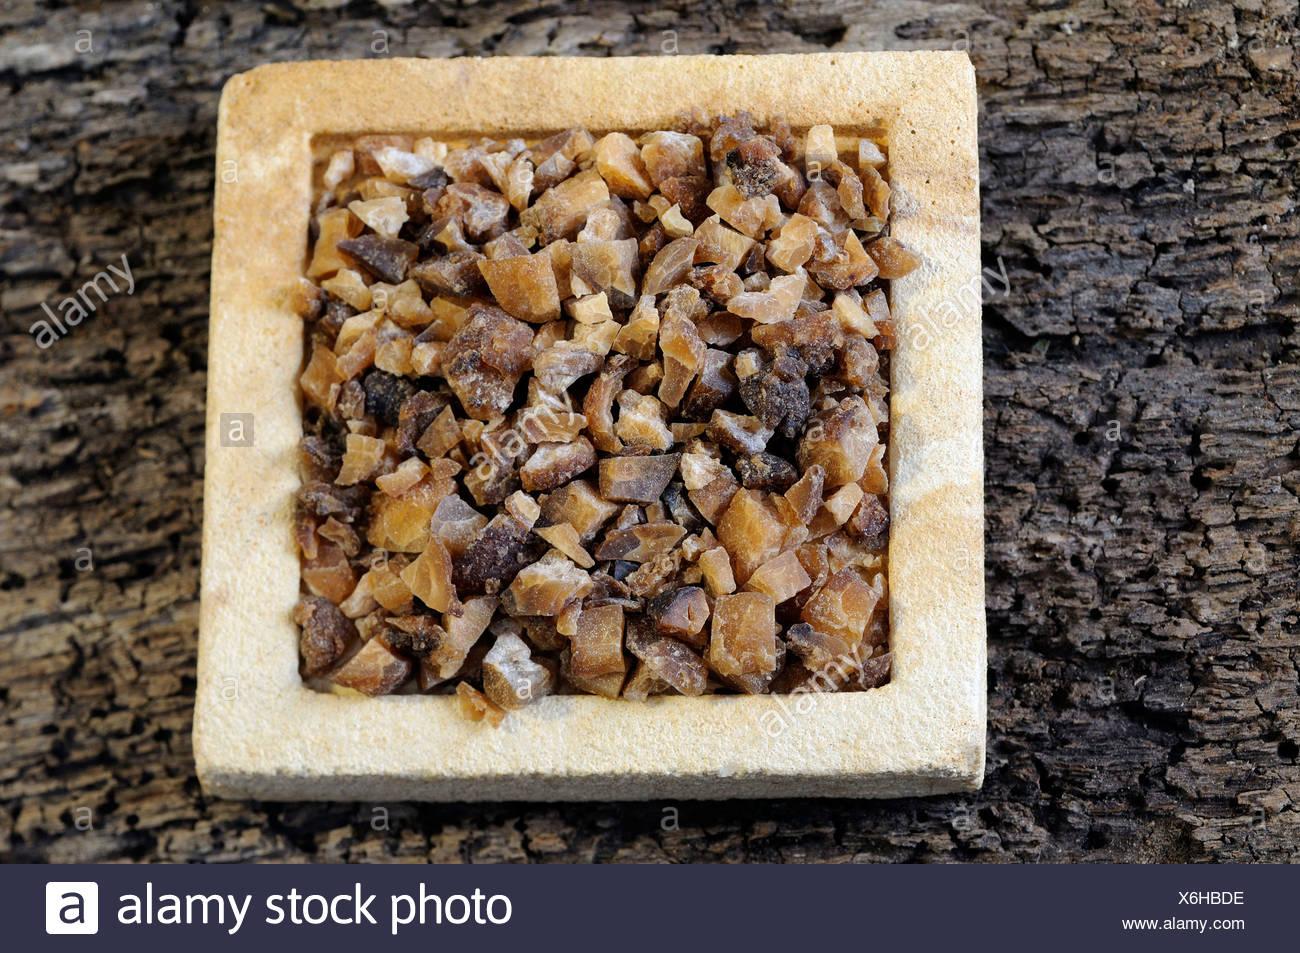 Pedate Pinallia Jackinthepulpit Rhizome - Stock Image